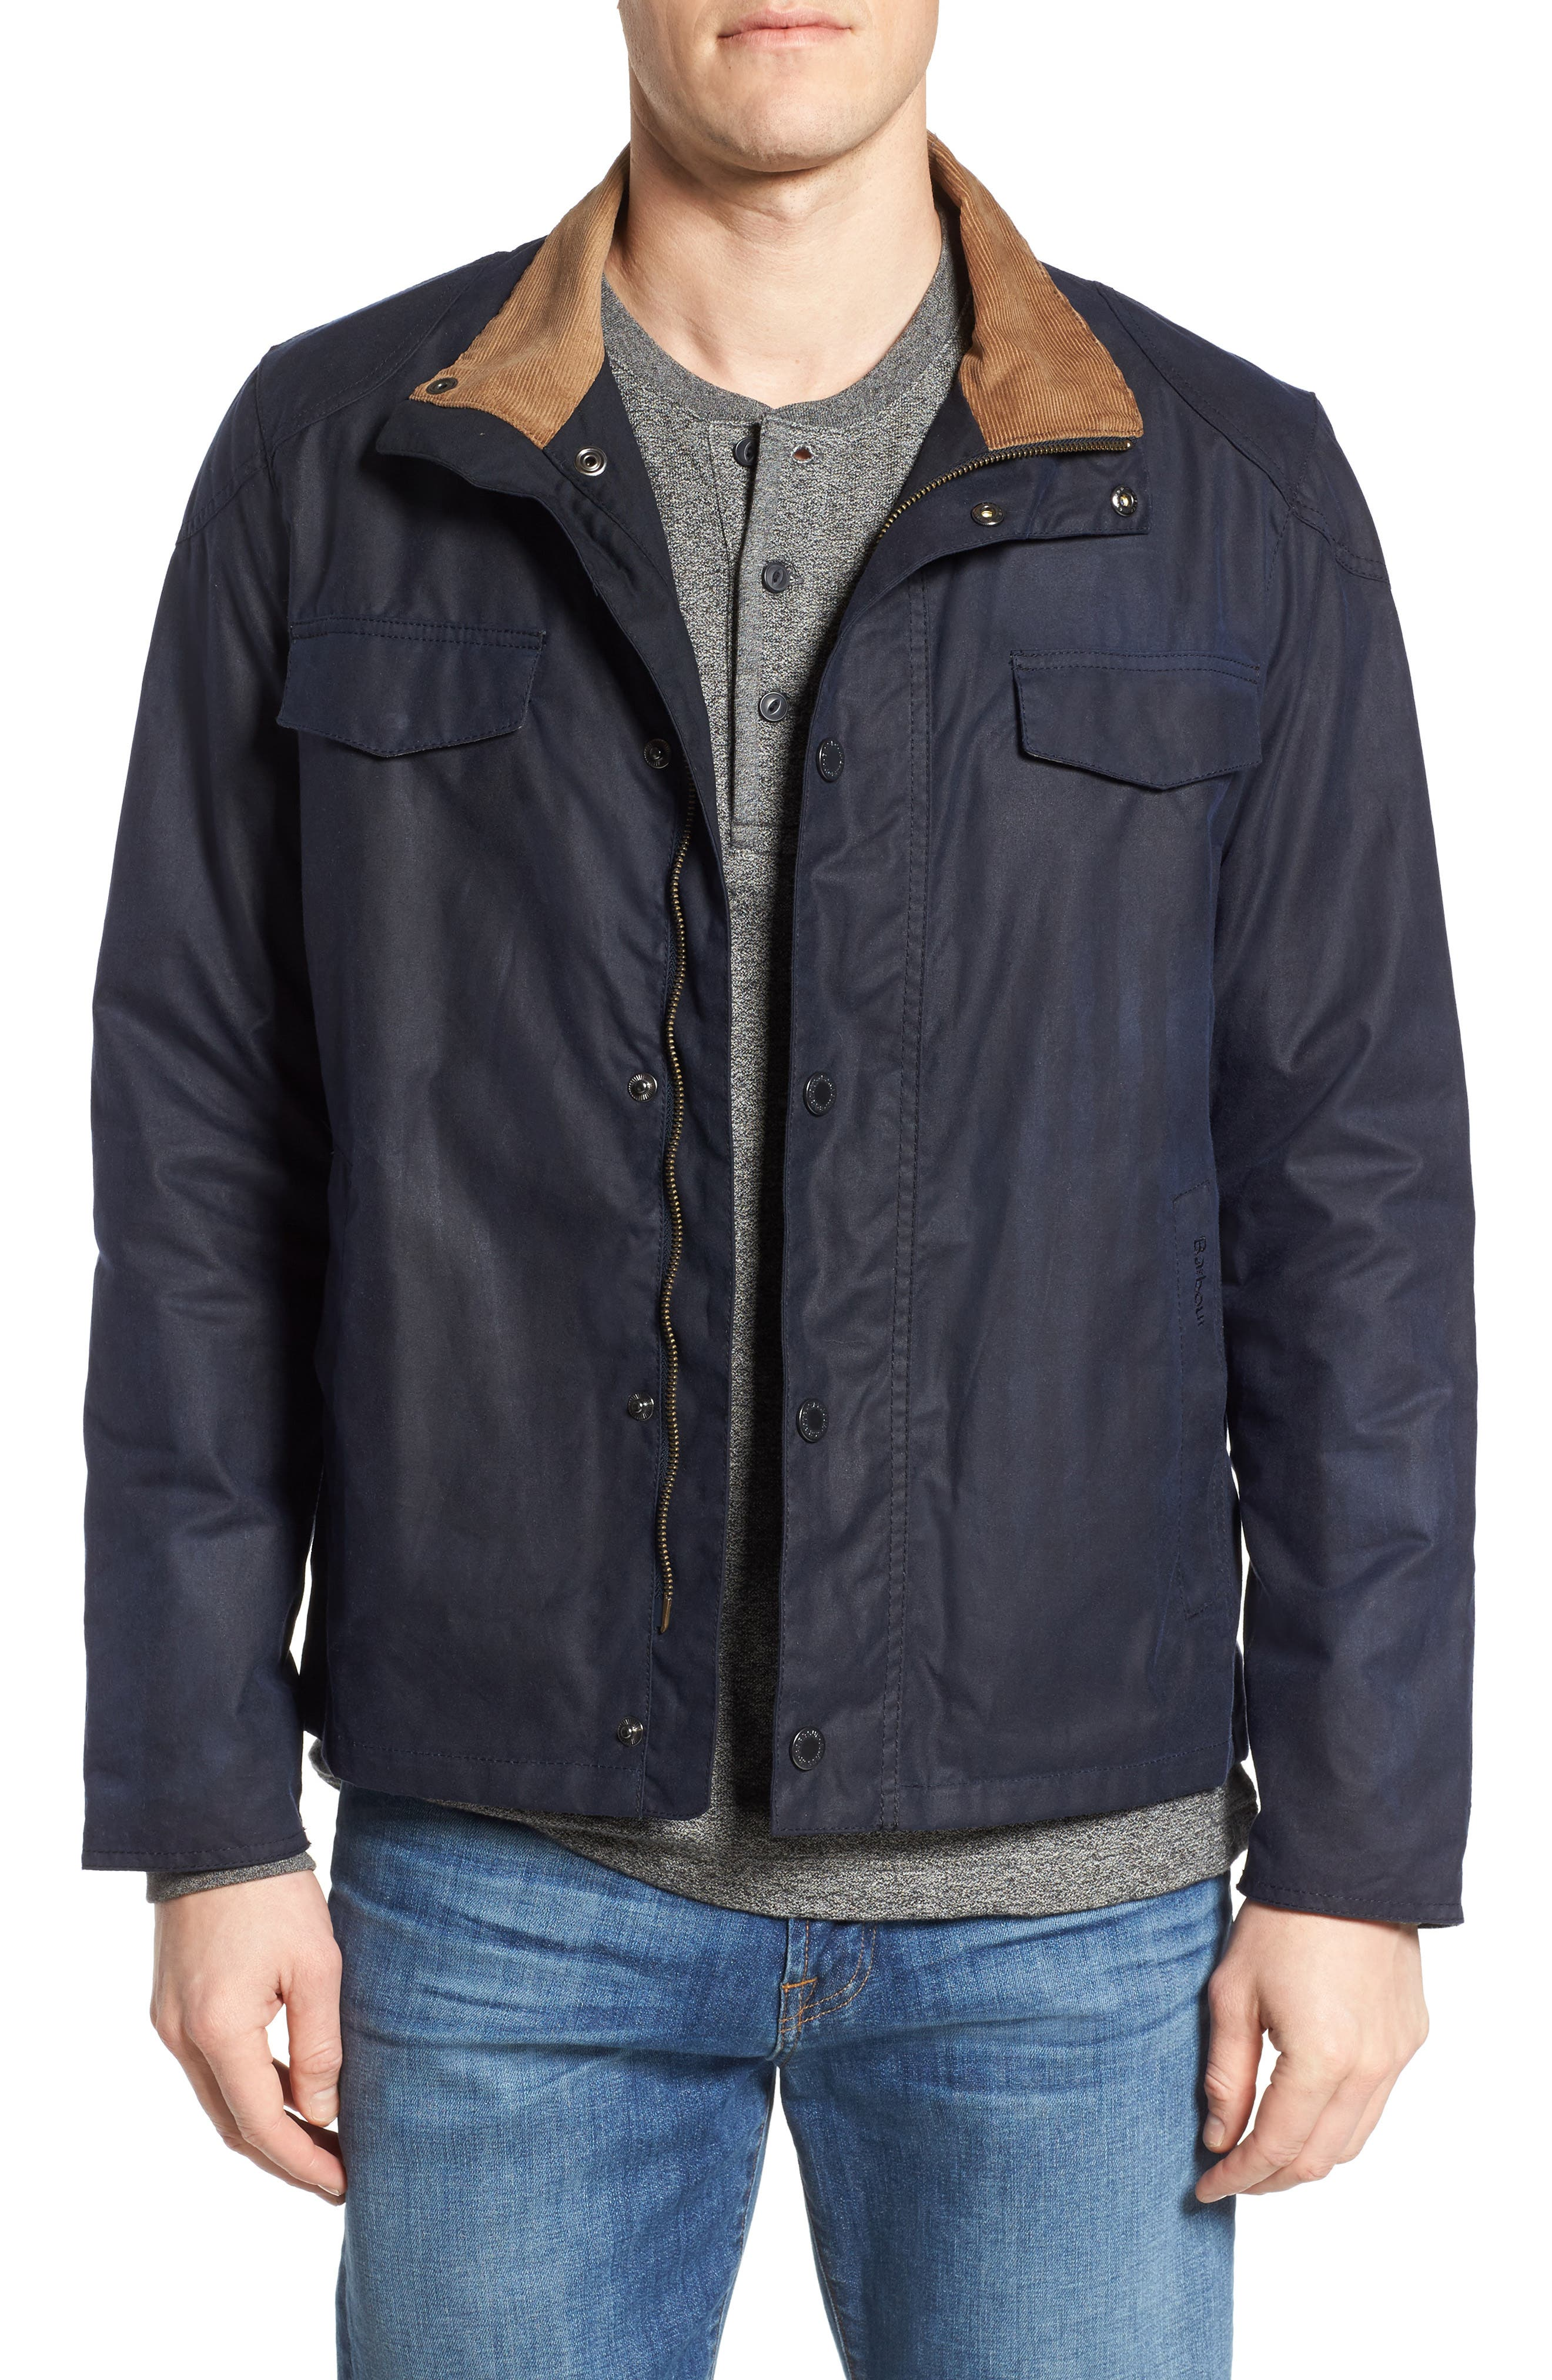 Lomond Waxed Cotton Jacket,                             Main thumbnail 1, color,                             410